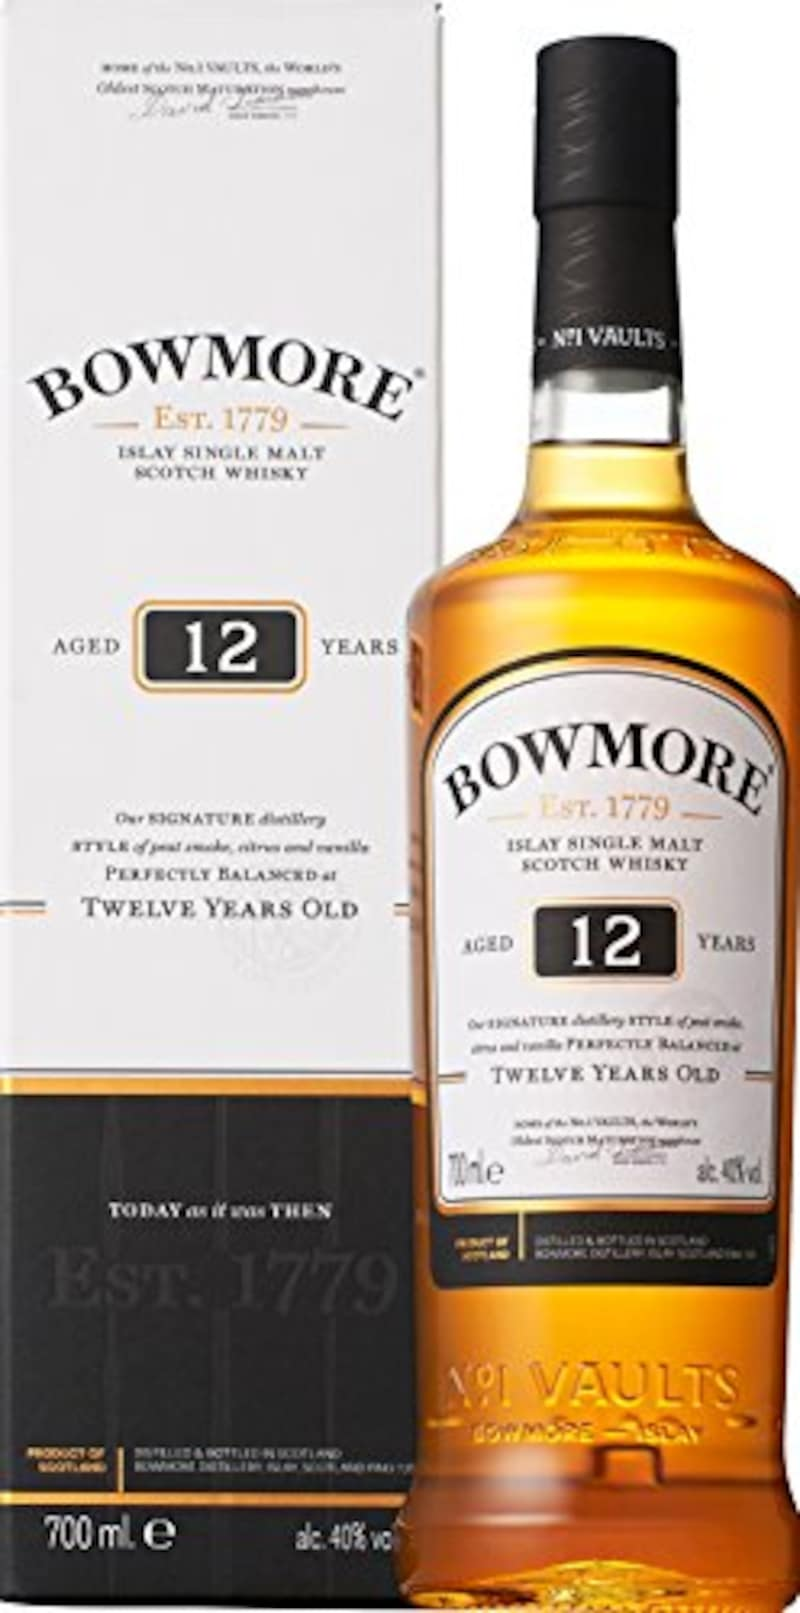 BOWMORE(ボウモア), ボウモア 12年